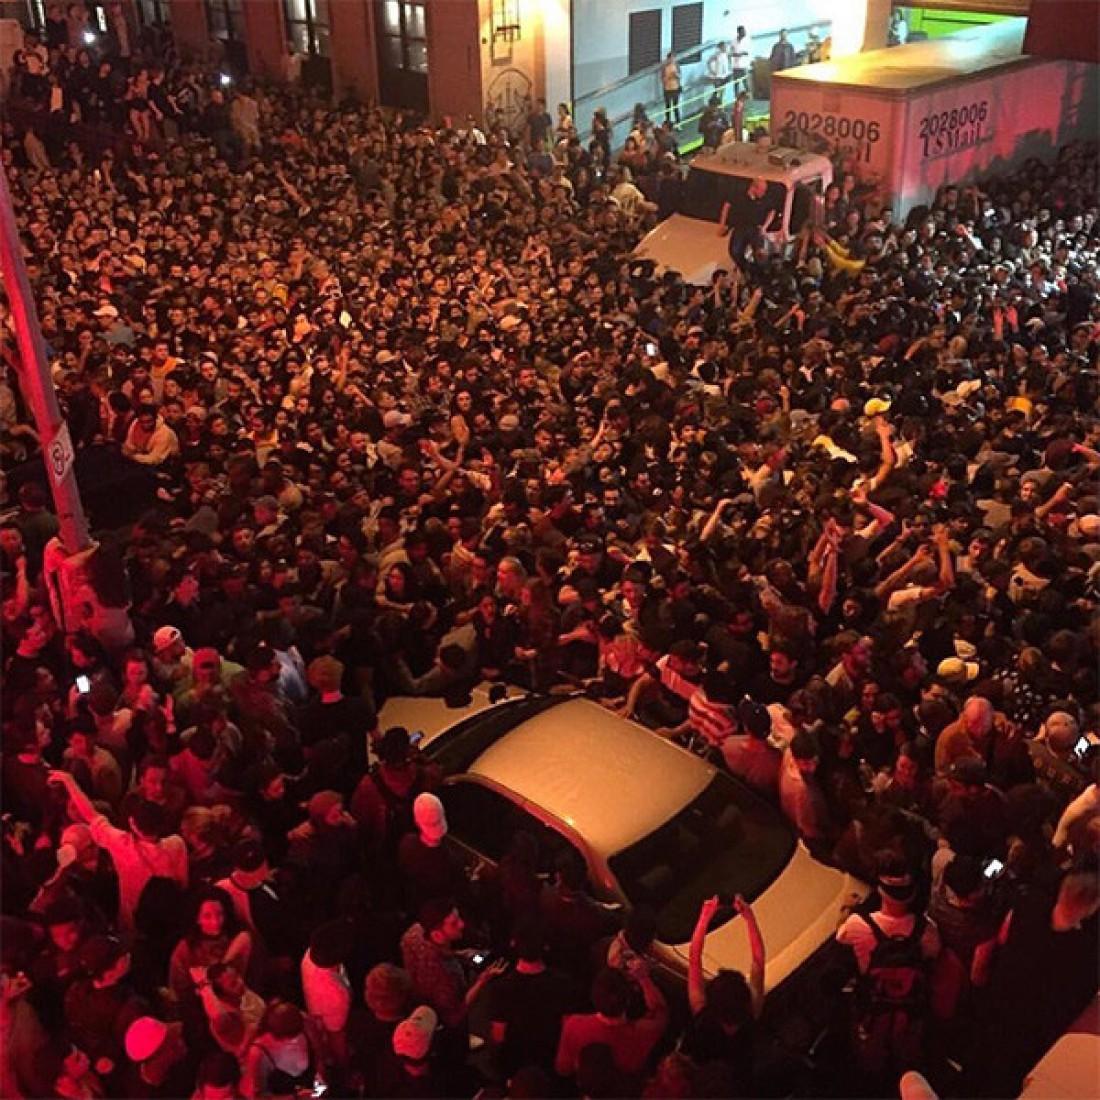 Беспорядки на улицах Нью-Йорка из-за концерта Канье Уэста